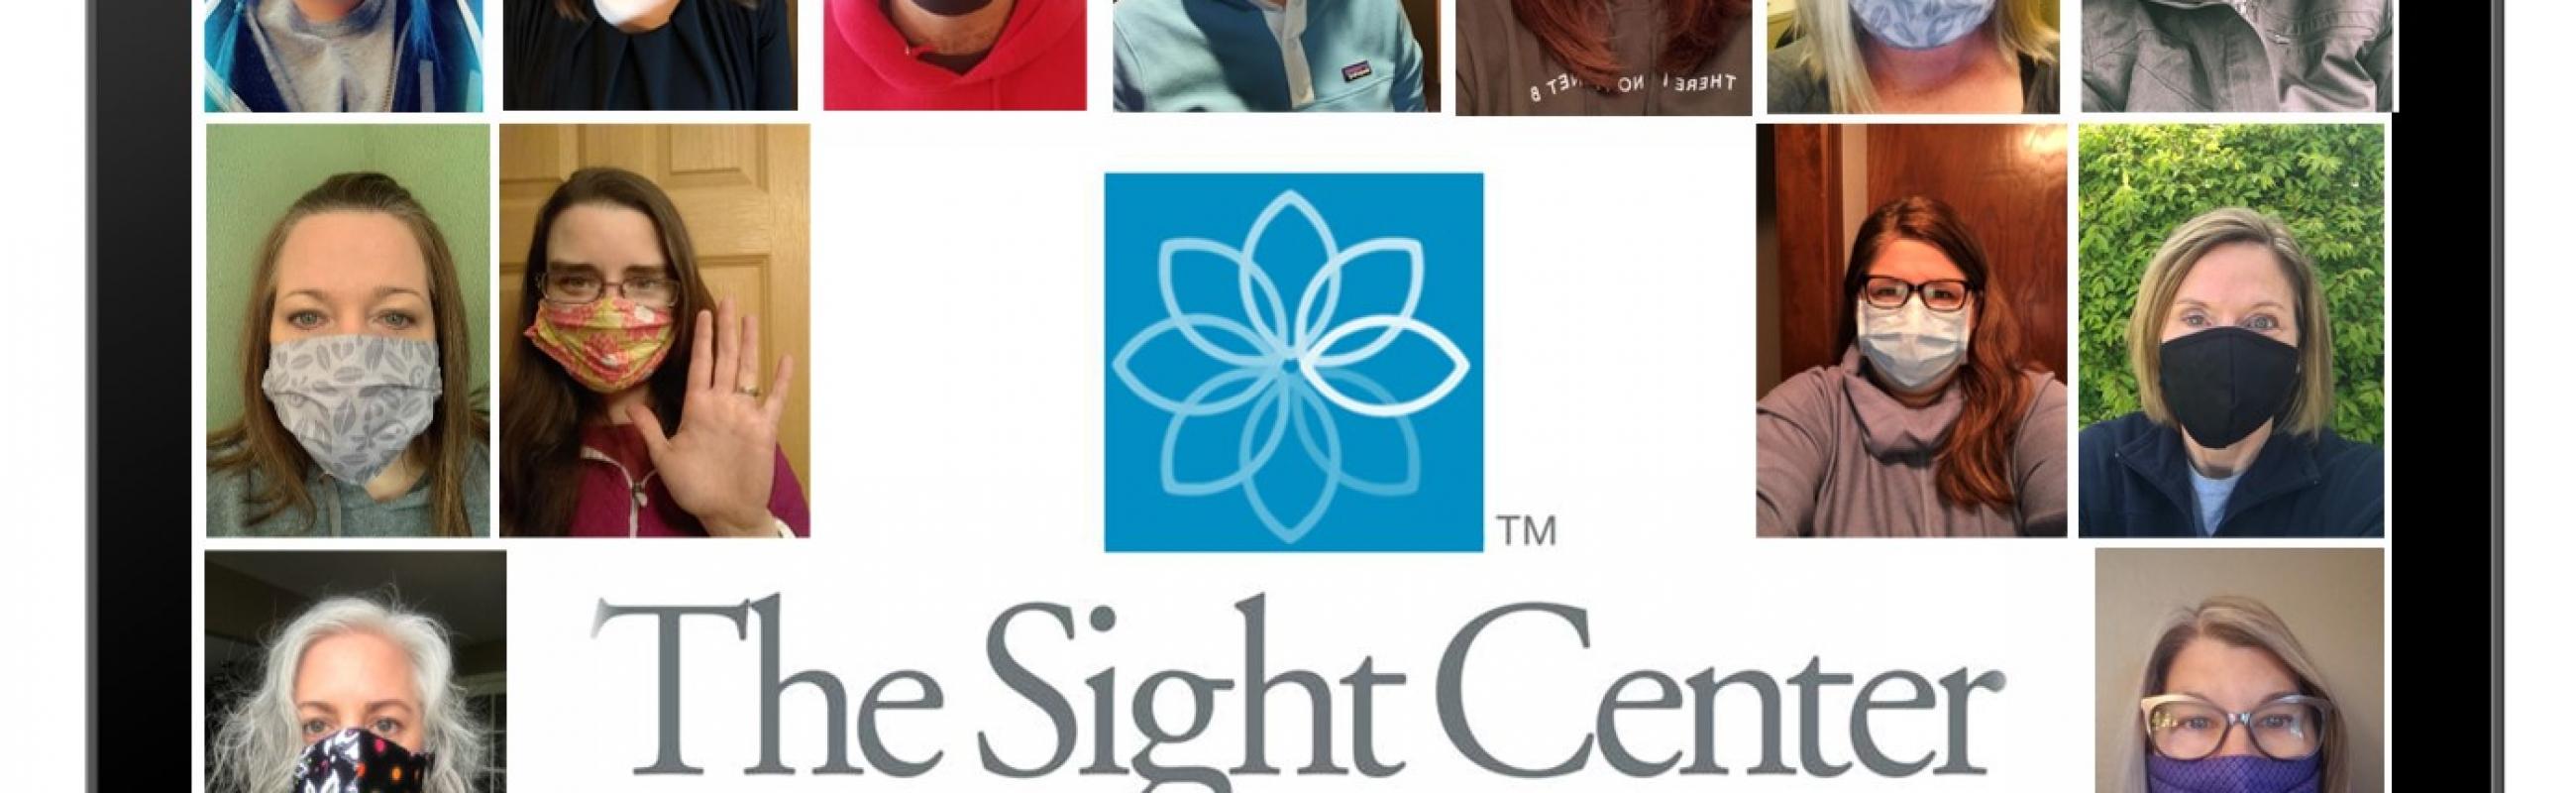 Sight Center Staff in Masks